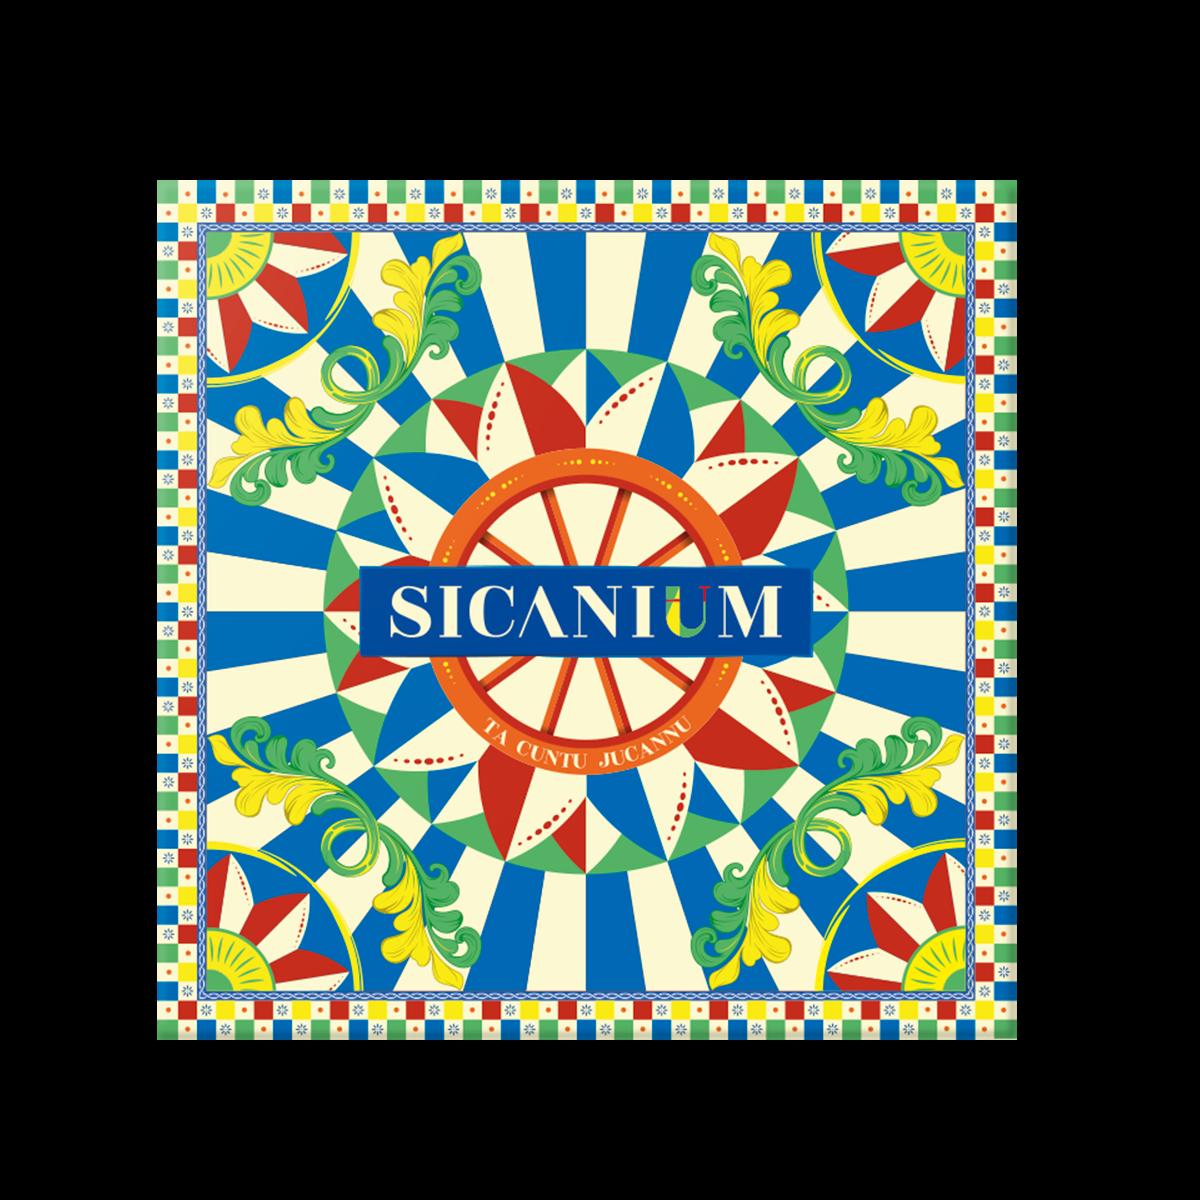 sicanium-1593509667.png